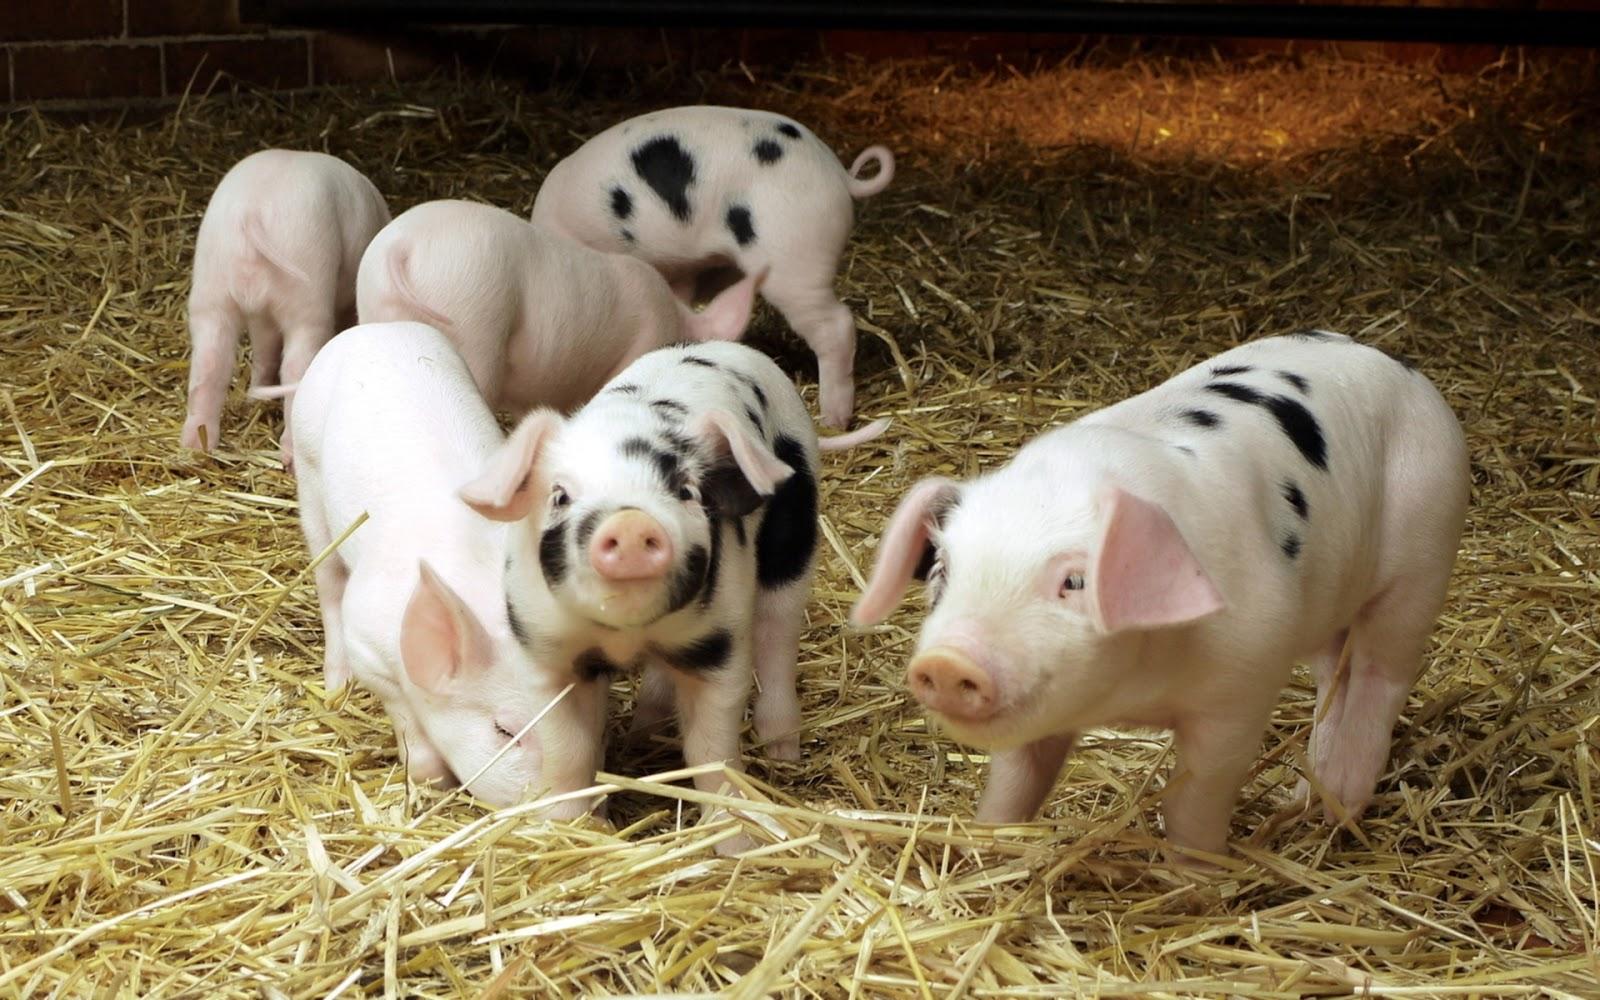 Cute Piglets Wallpaper Cute Pigs Mystery Wallpaper